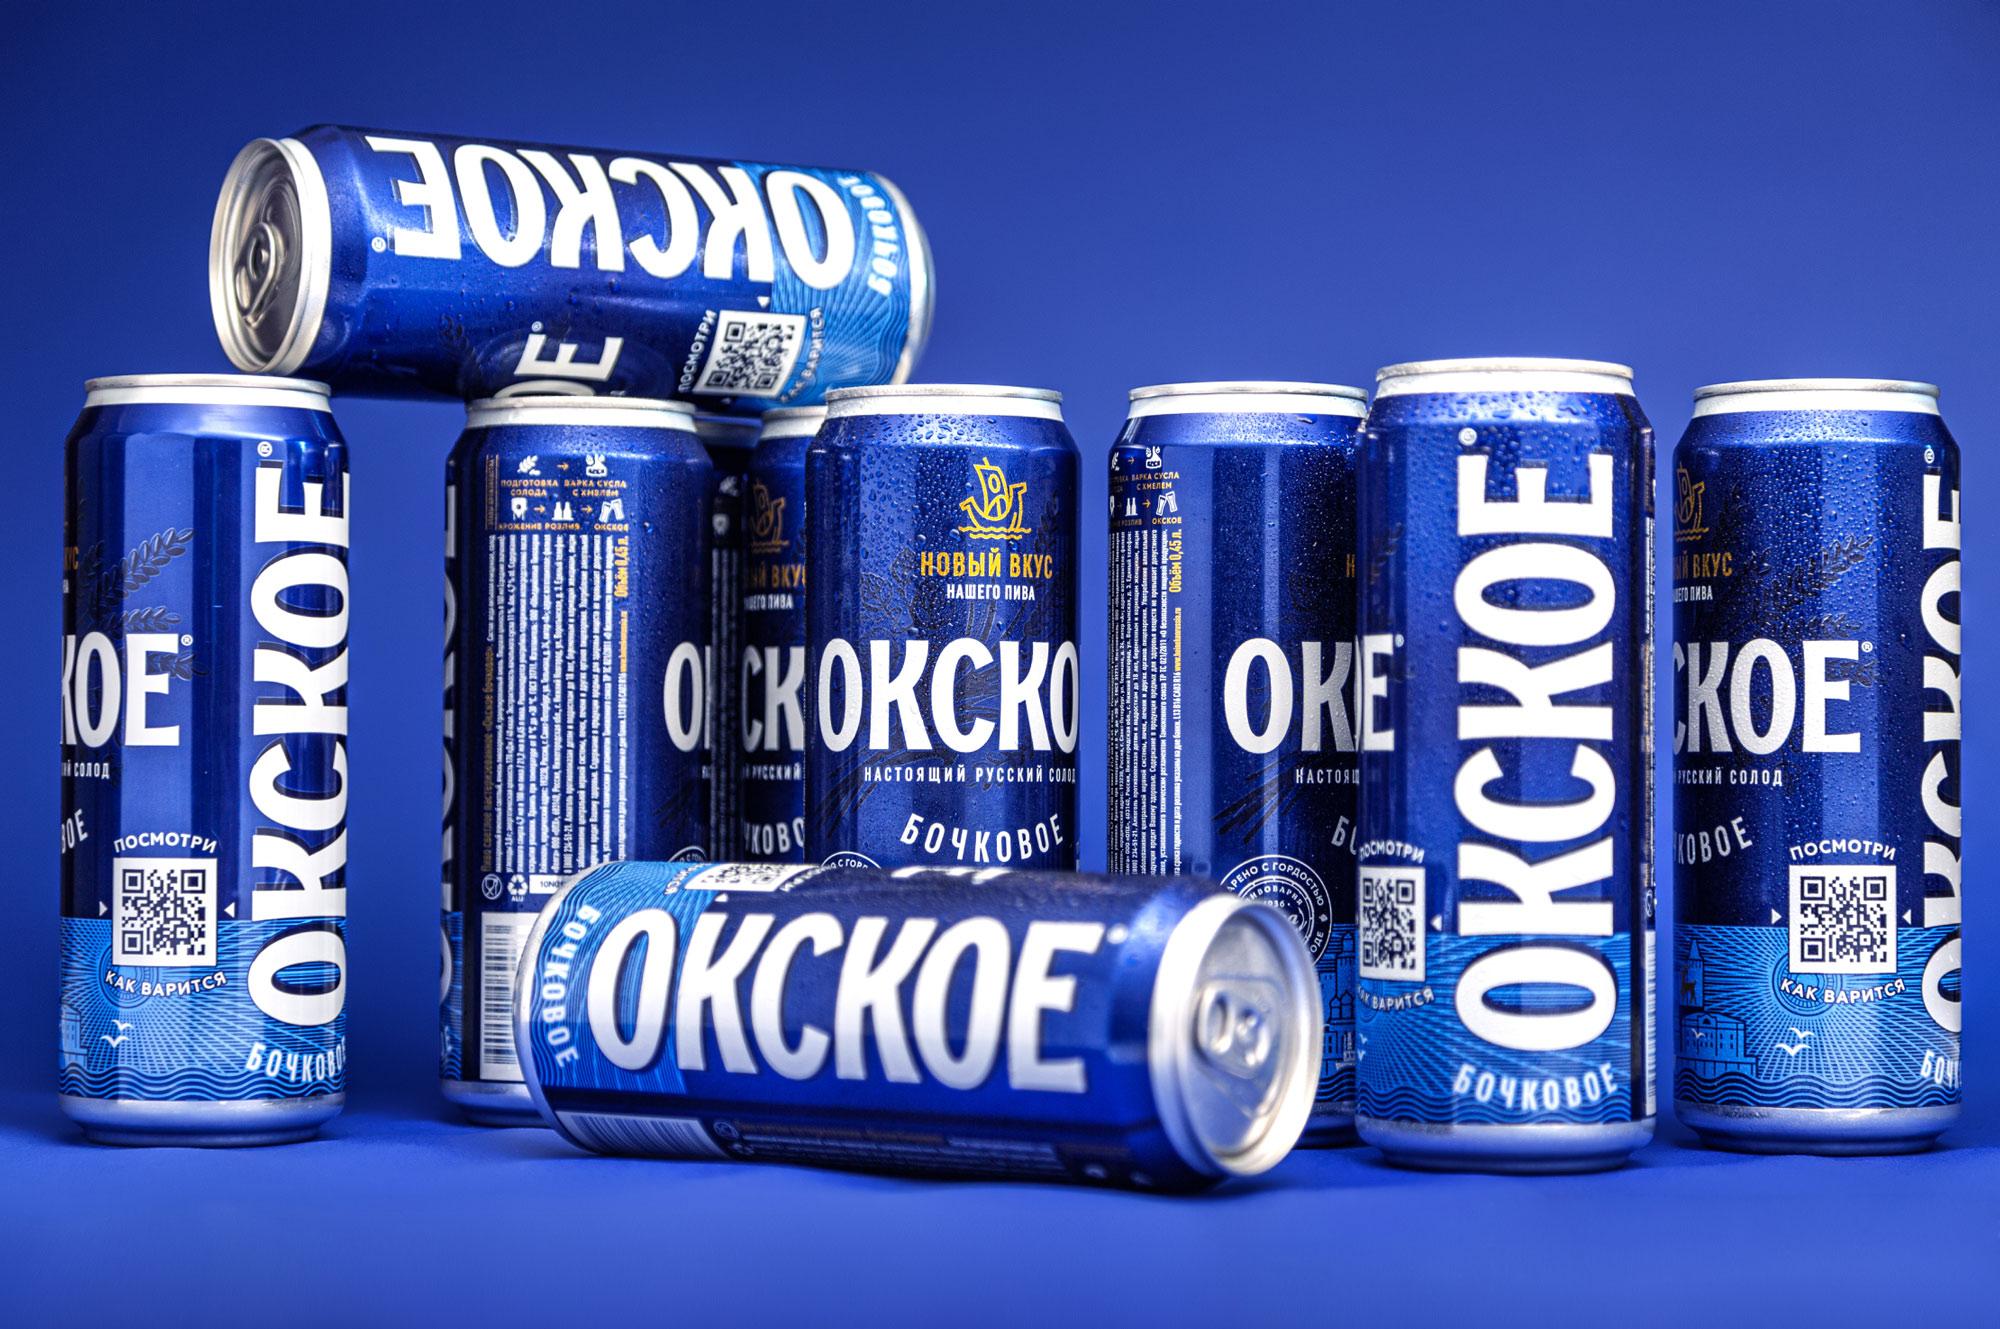 Unblvbl Branding Agency Create New Rebranding for Heineken Okskoye Beer Brand in Russia